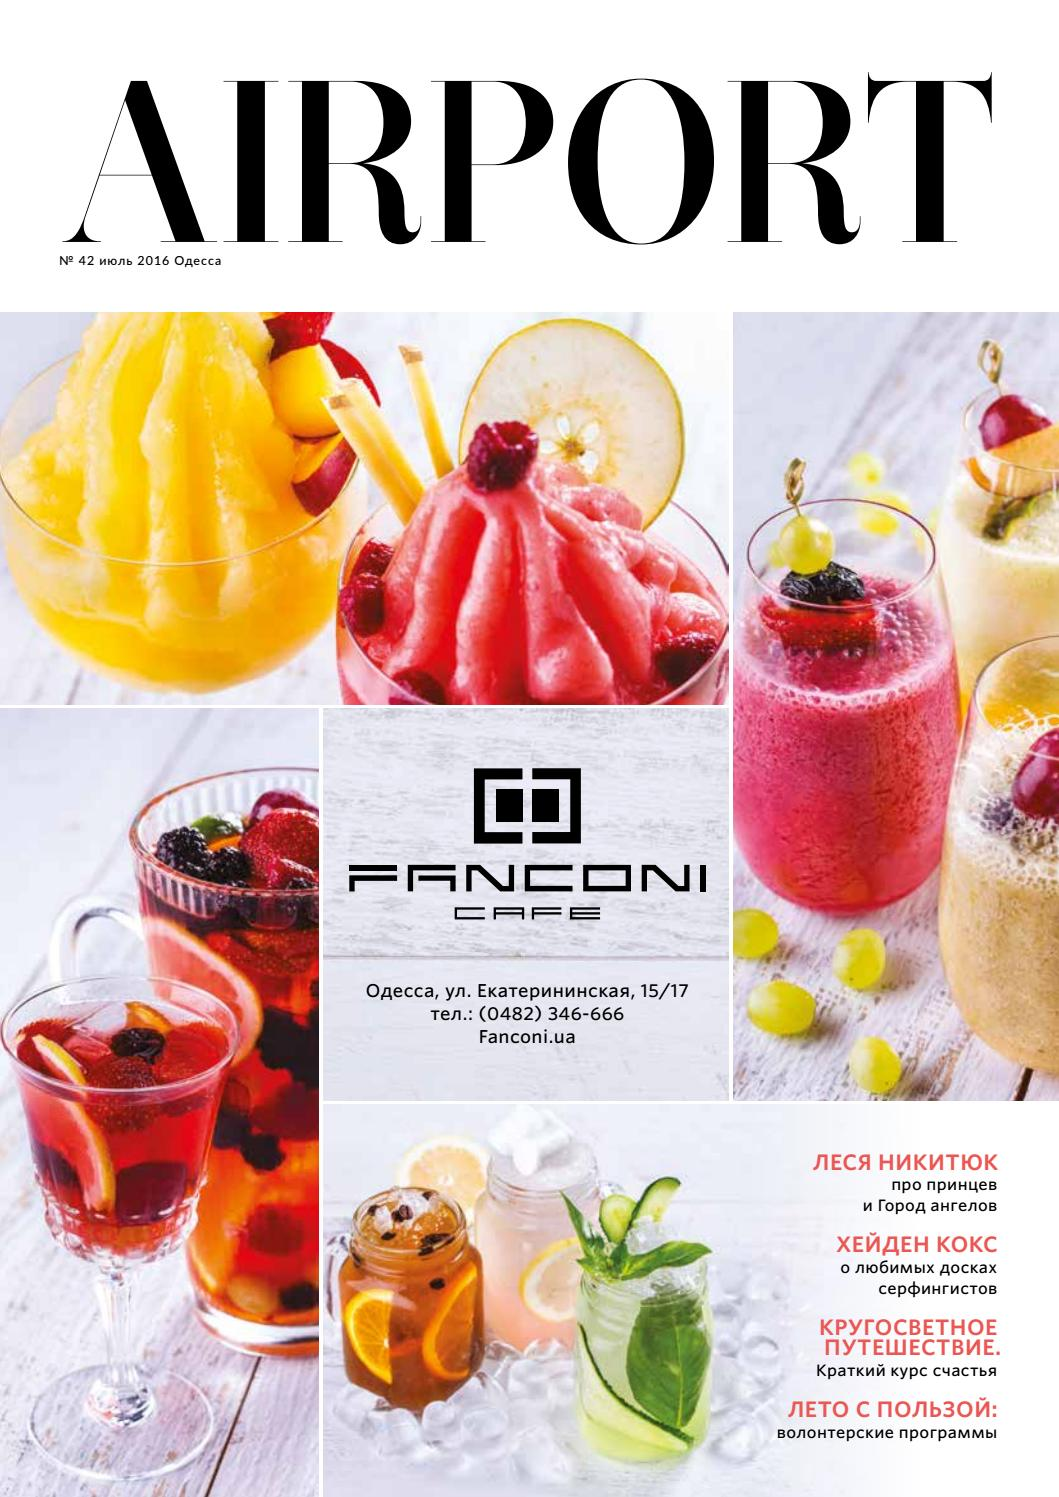 Salon De Jardin Lounge Génial July 16 by Airport Magazine Odessa issuu Of 20 Élégant Salon De Jardin Lounge